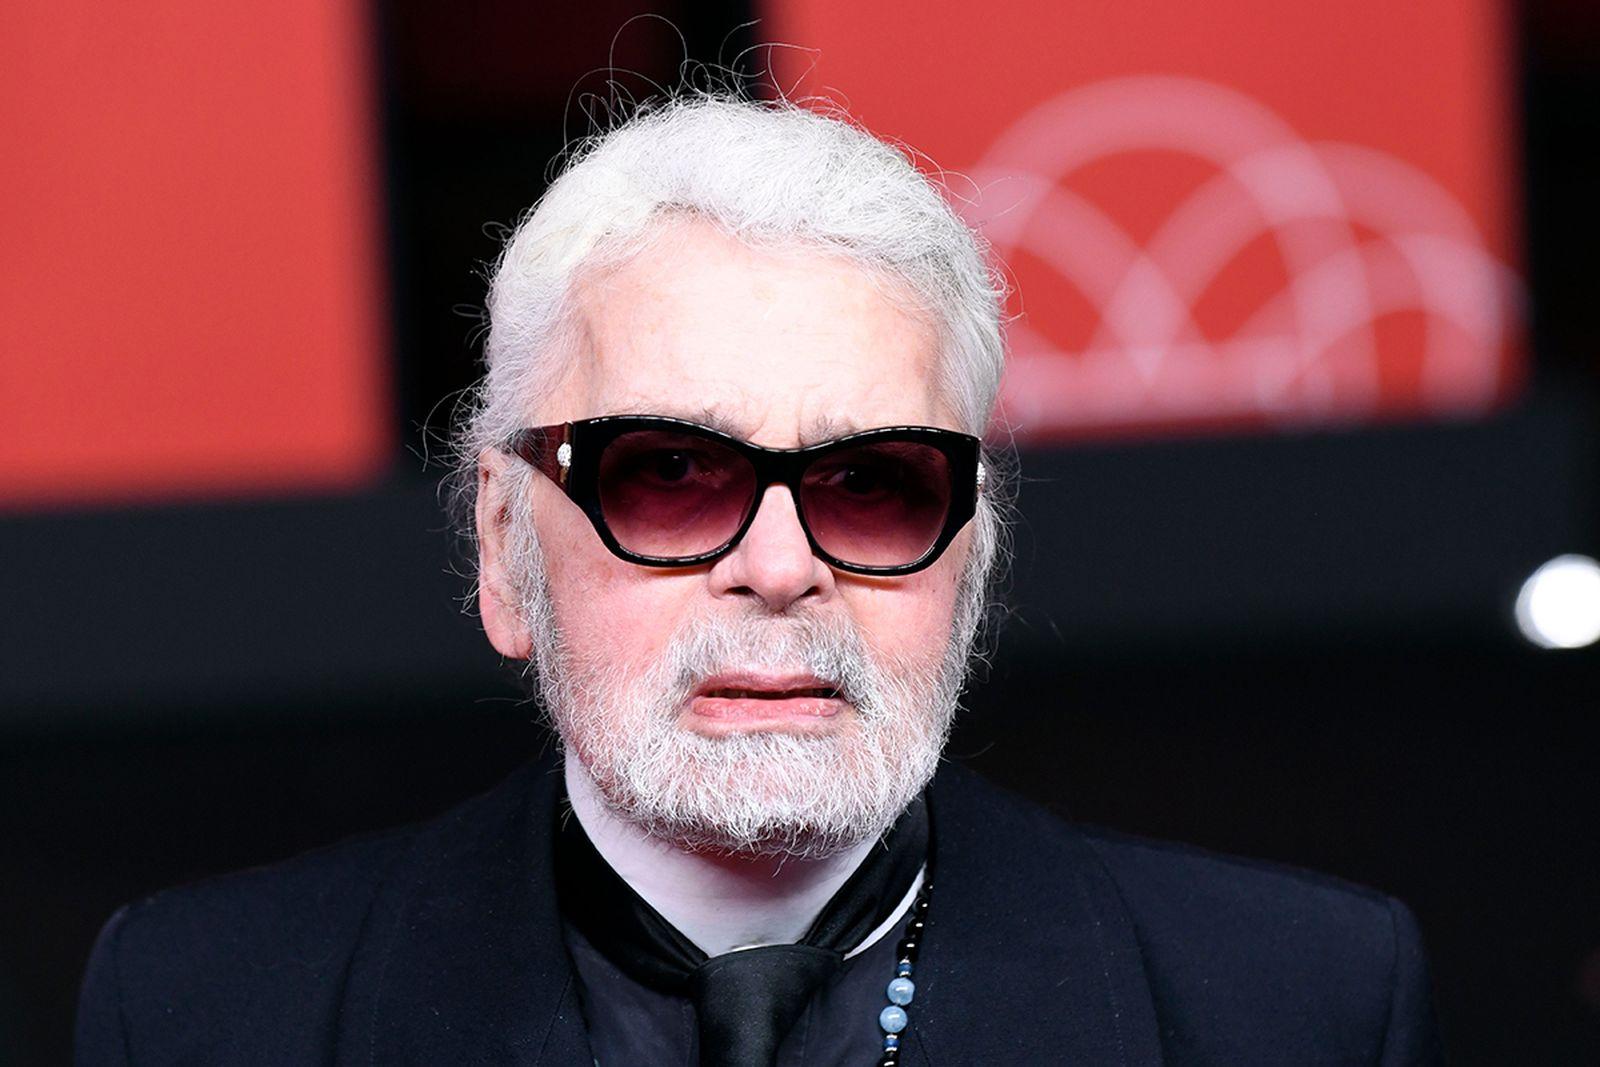 Karl Lagerfeld glasses